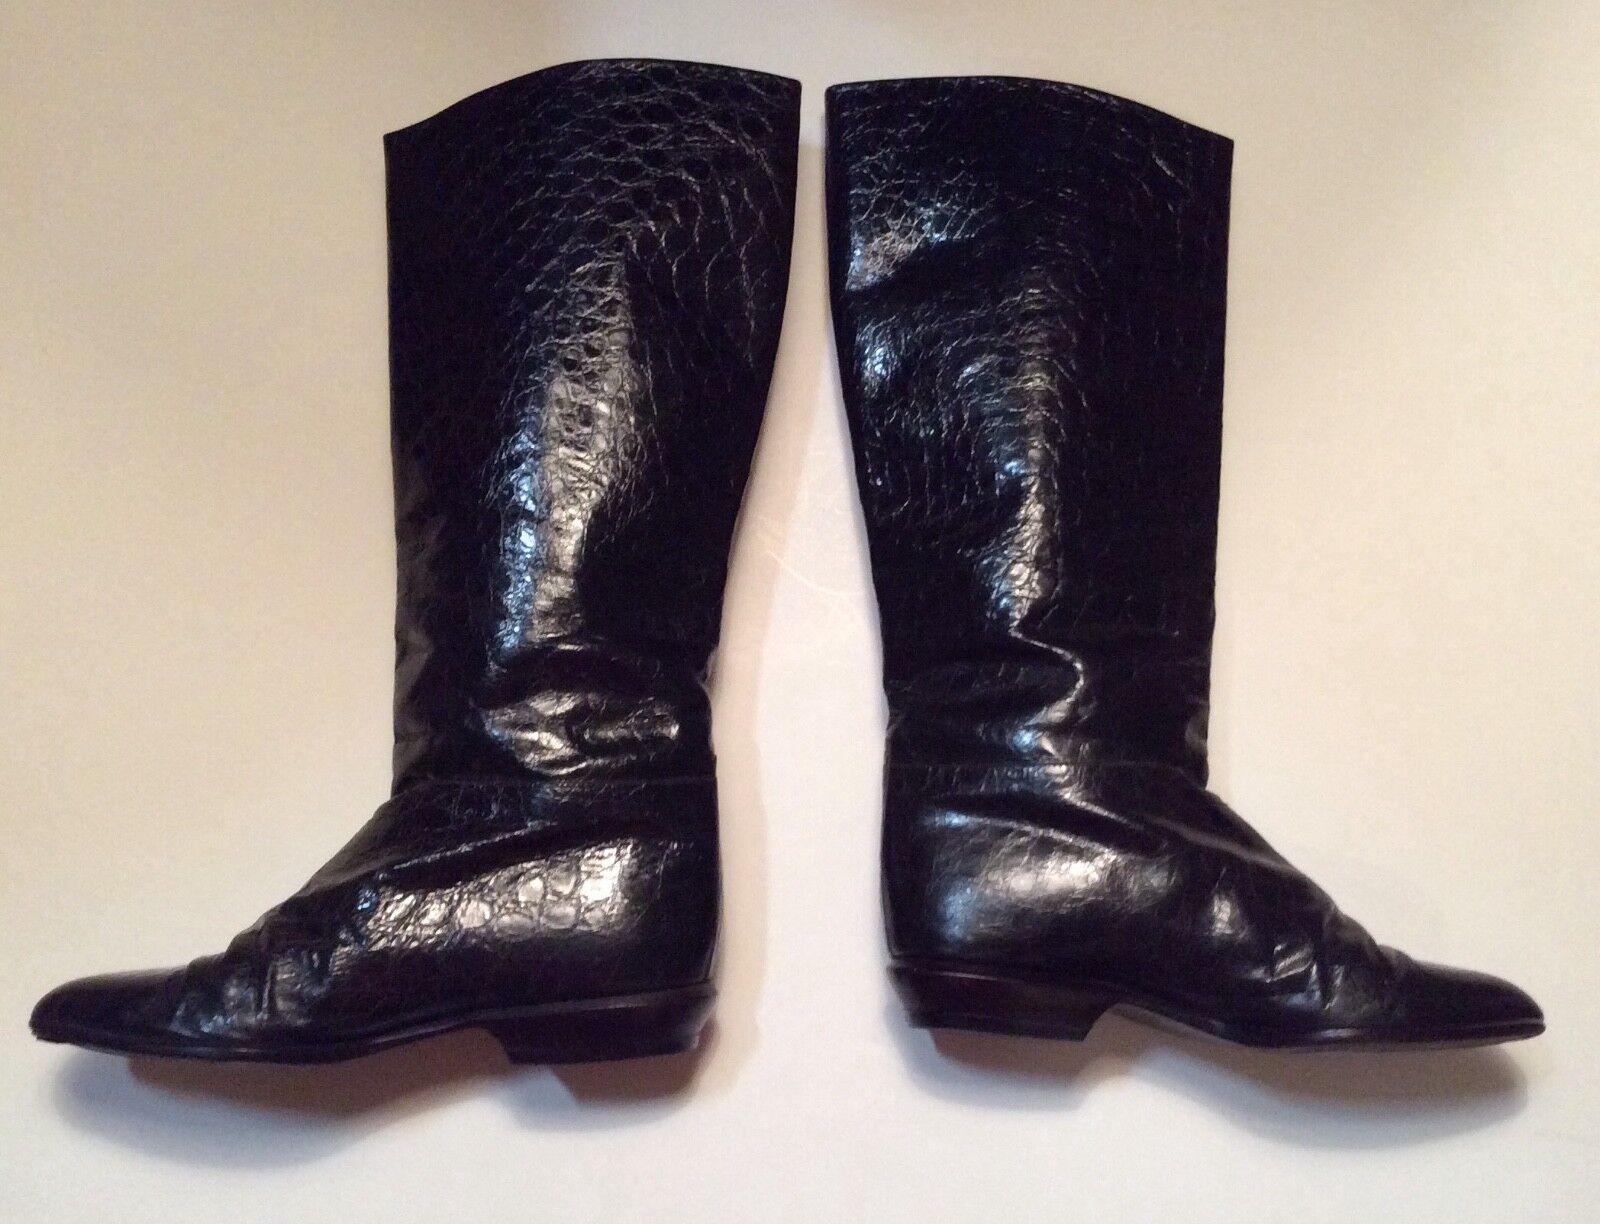 Monique ladies Vtg.Italian croc embossed leather boot sz 8M dk brown16.5 H